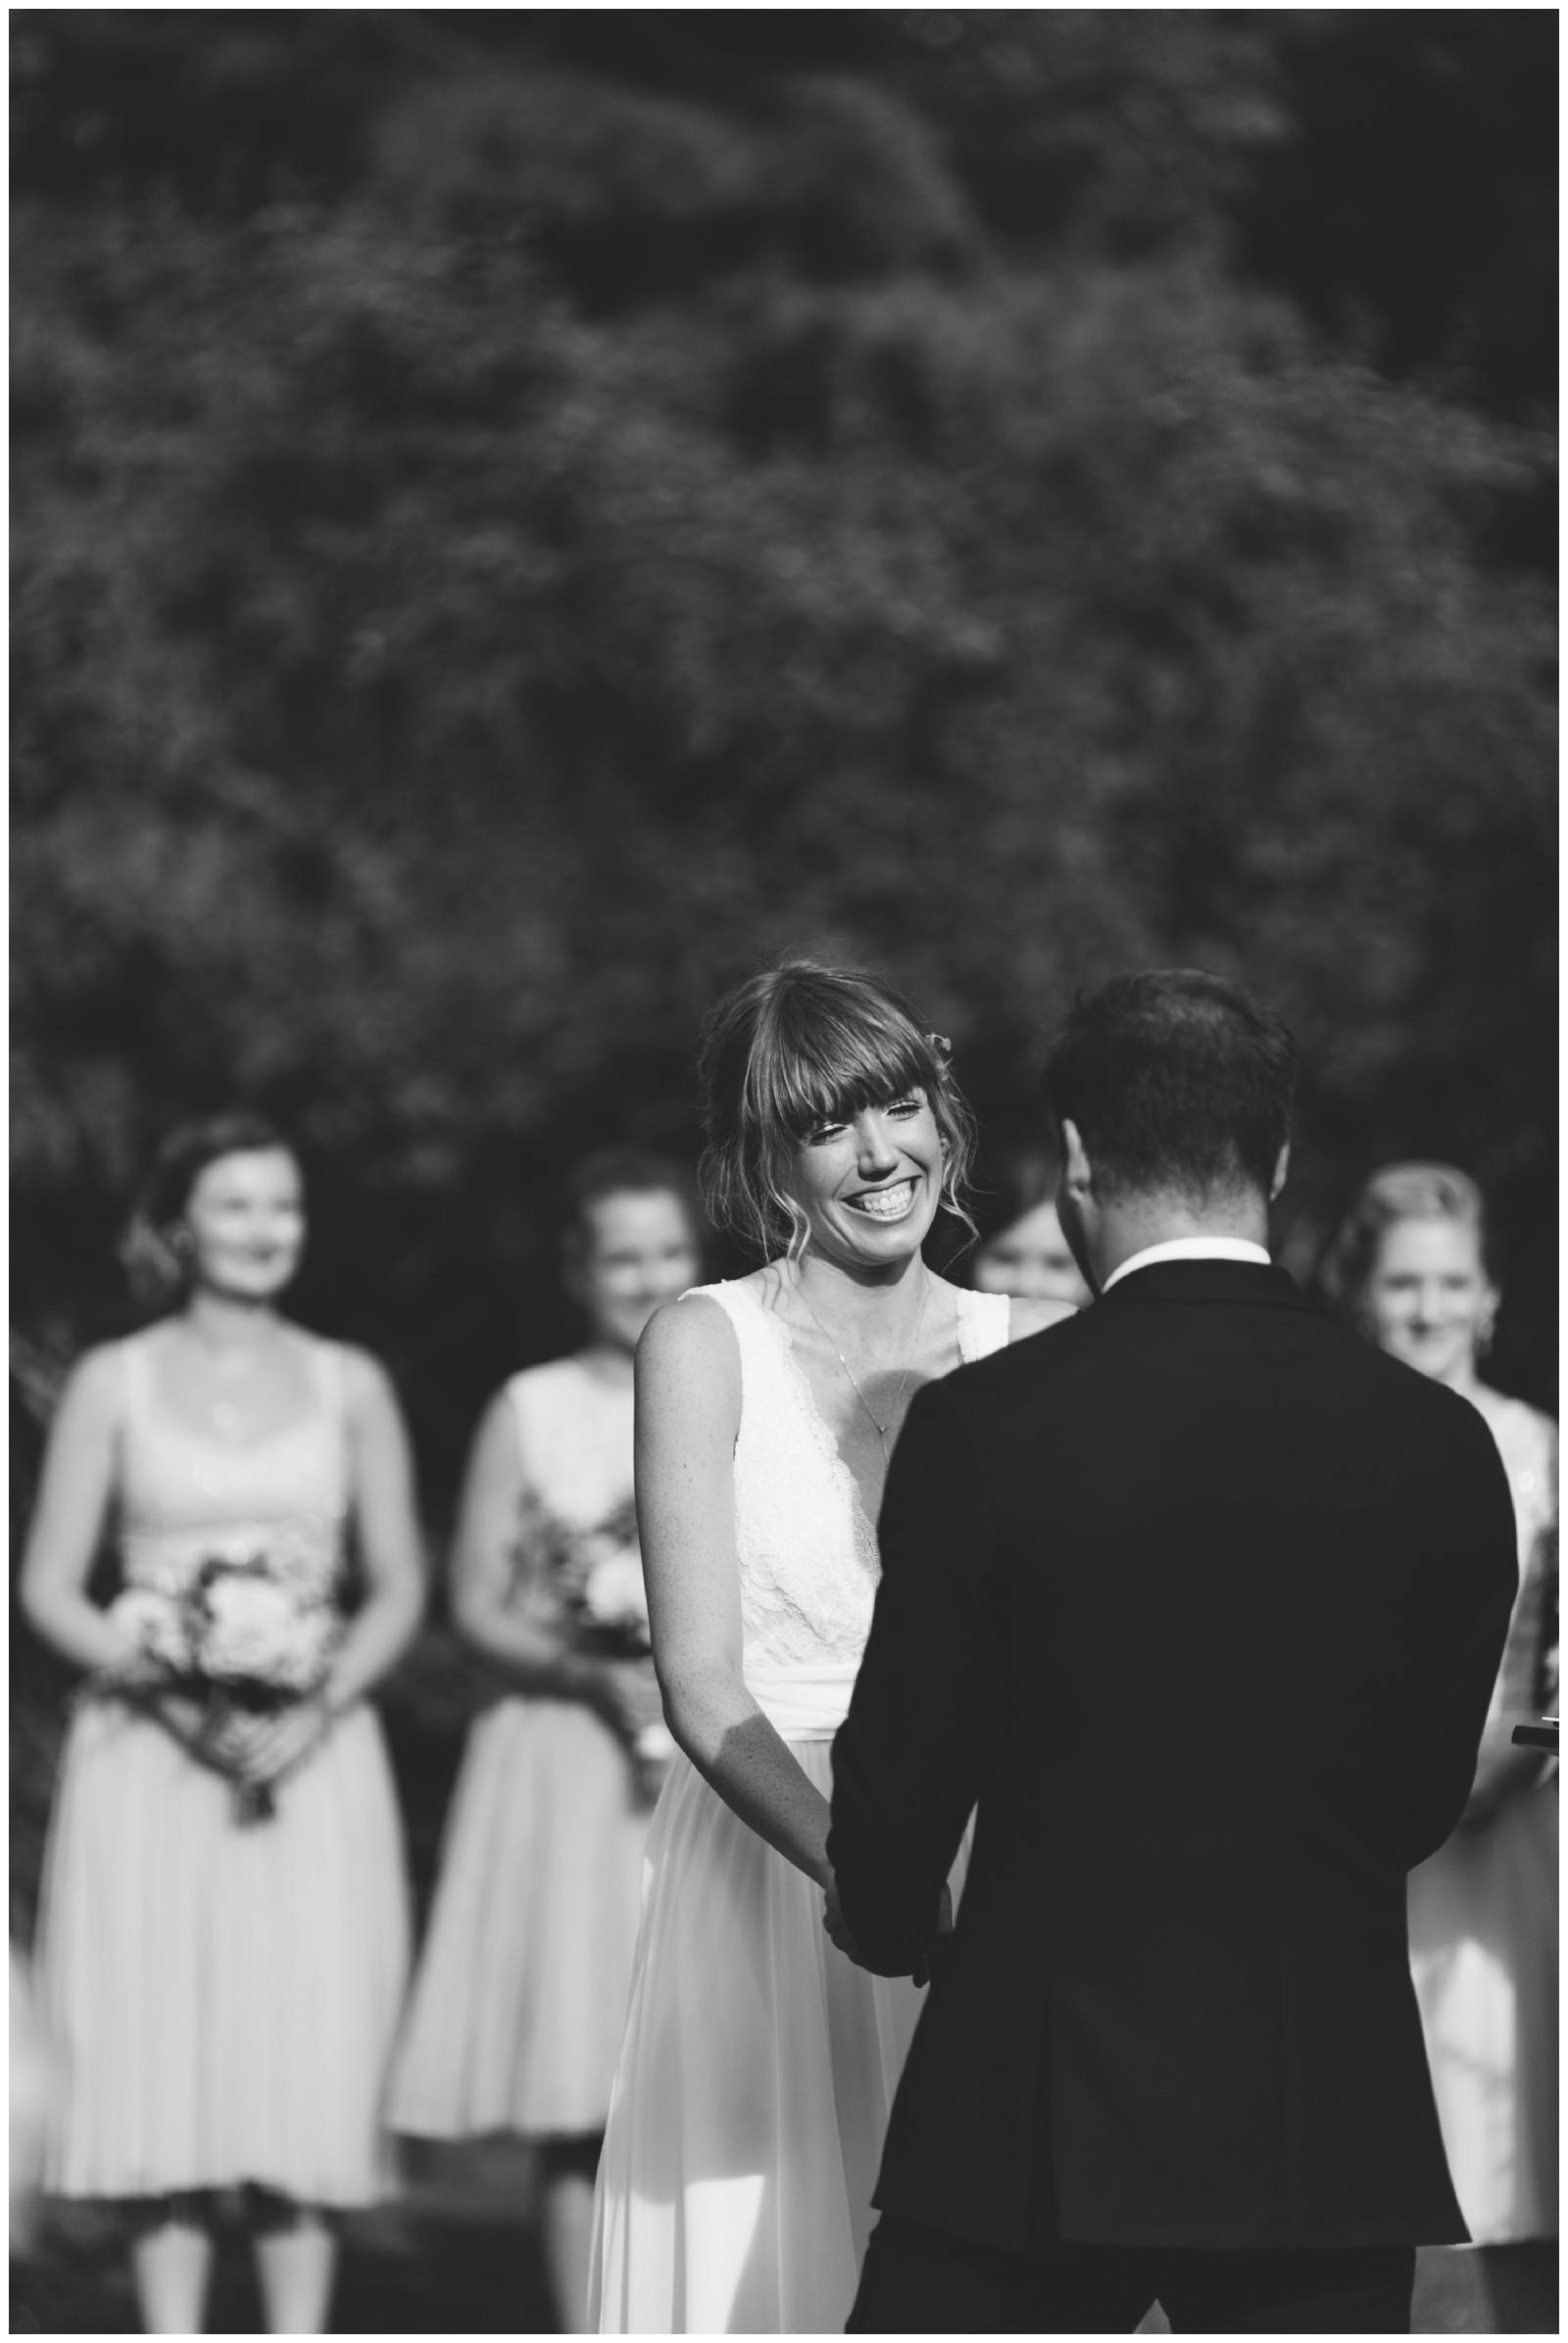 Moraine-Farm-wedding-Bailey-Q-Photo-Massachusetts-wedding-photpgrapher-073.jpg